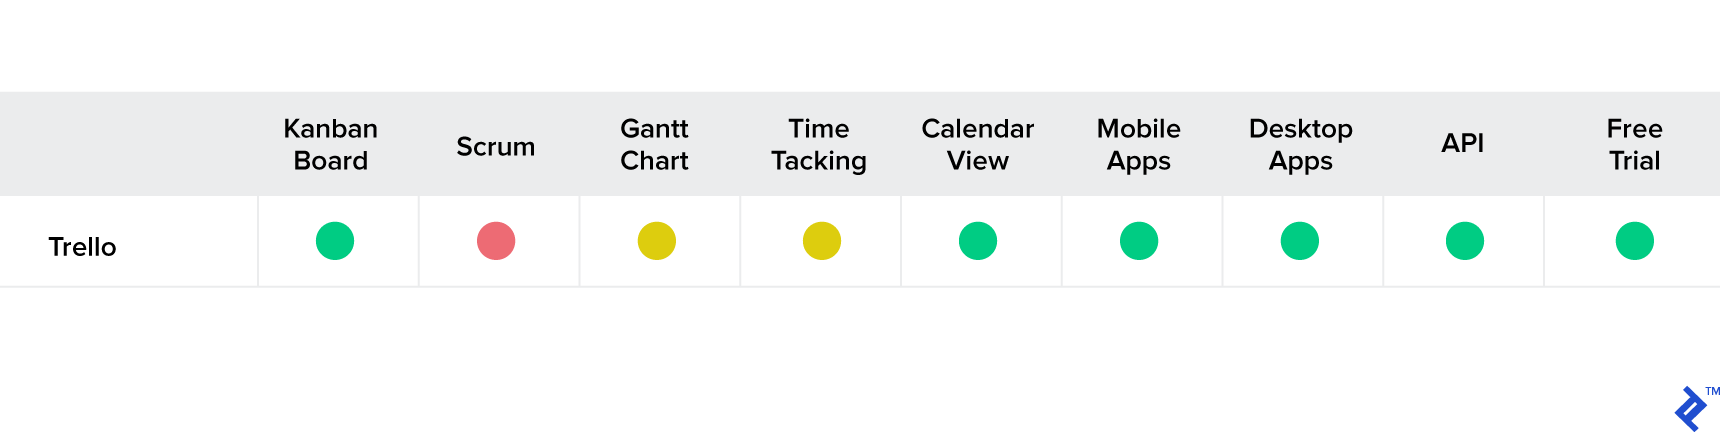 Trello feature set for project management.